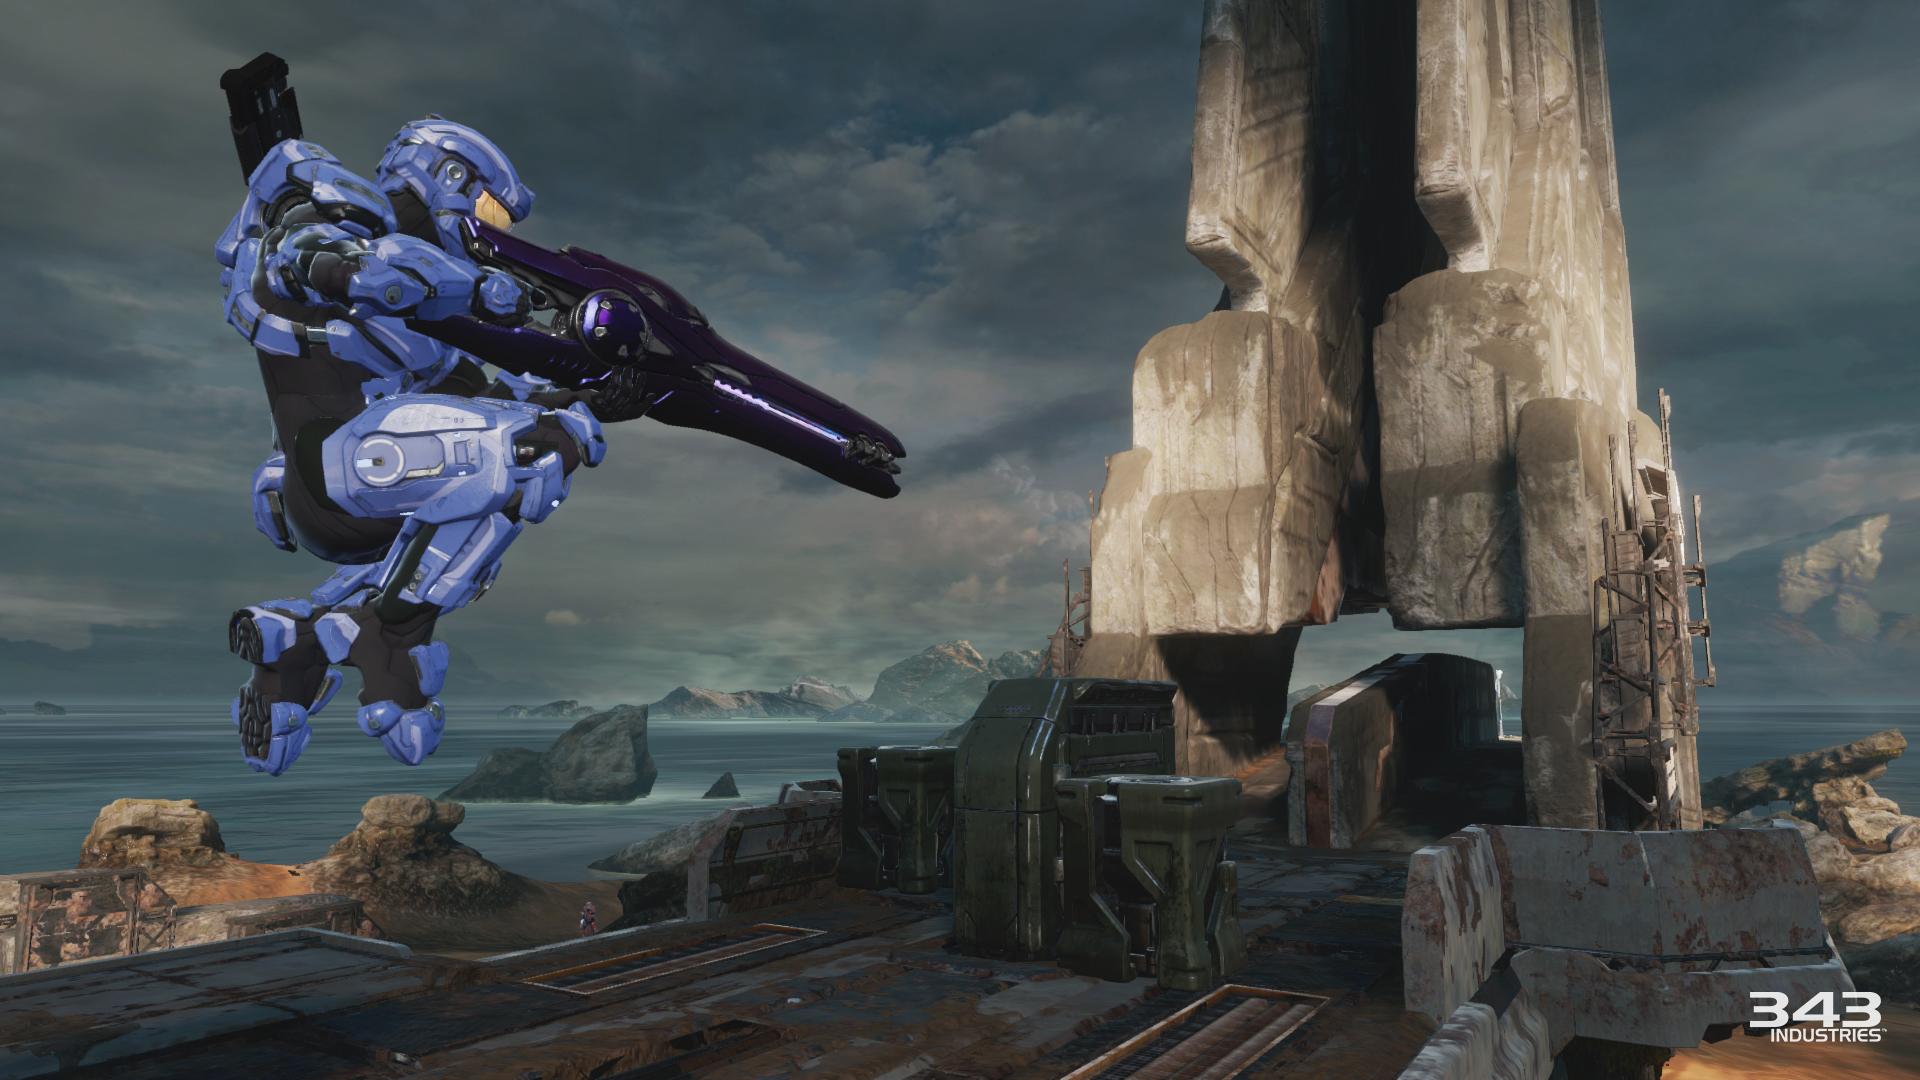 Vyšla kampaň Halo 3: ODST do Halo: The Master Chief Collection 109410